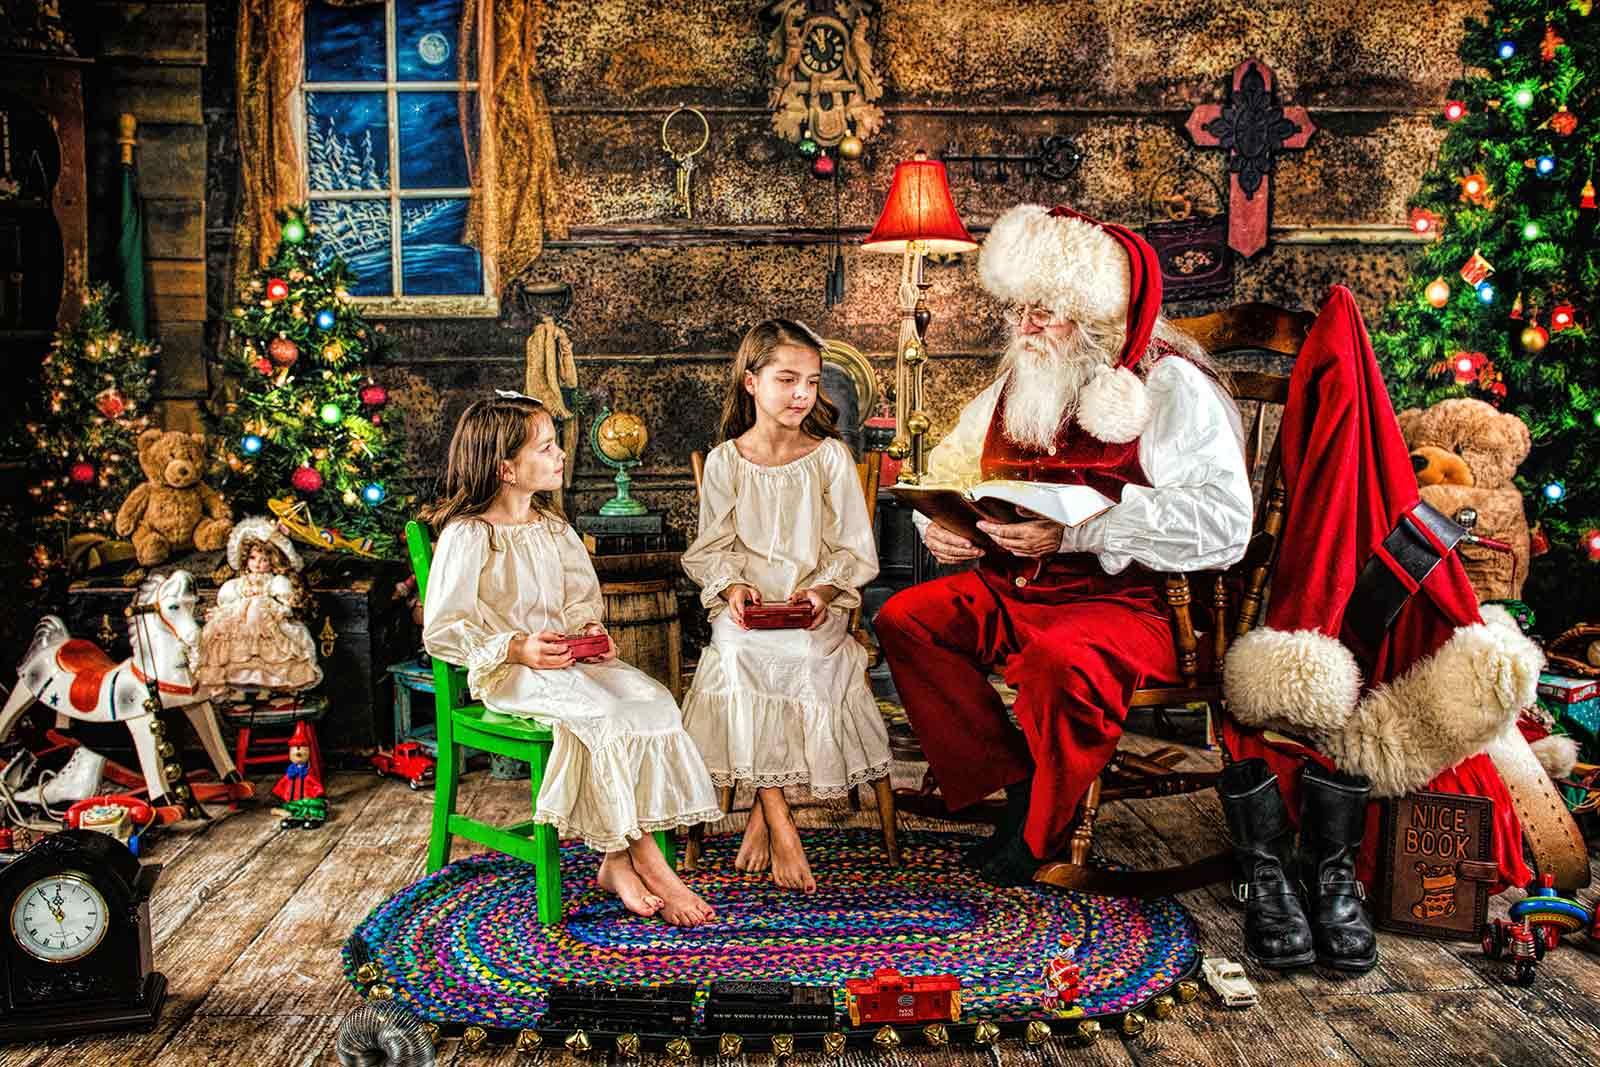 009_Magic-of-Santa-Anna-Thielen-Photography